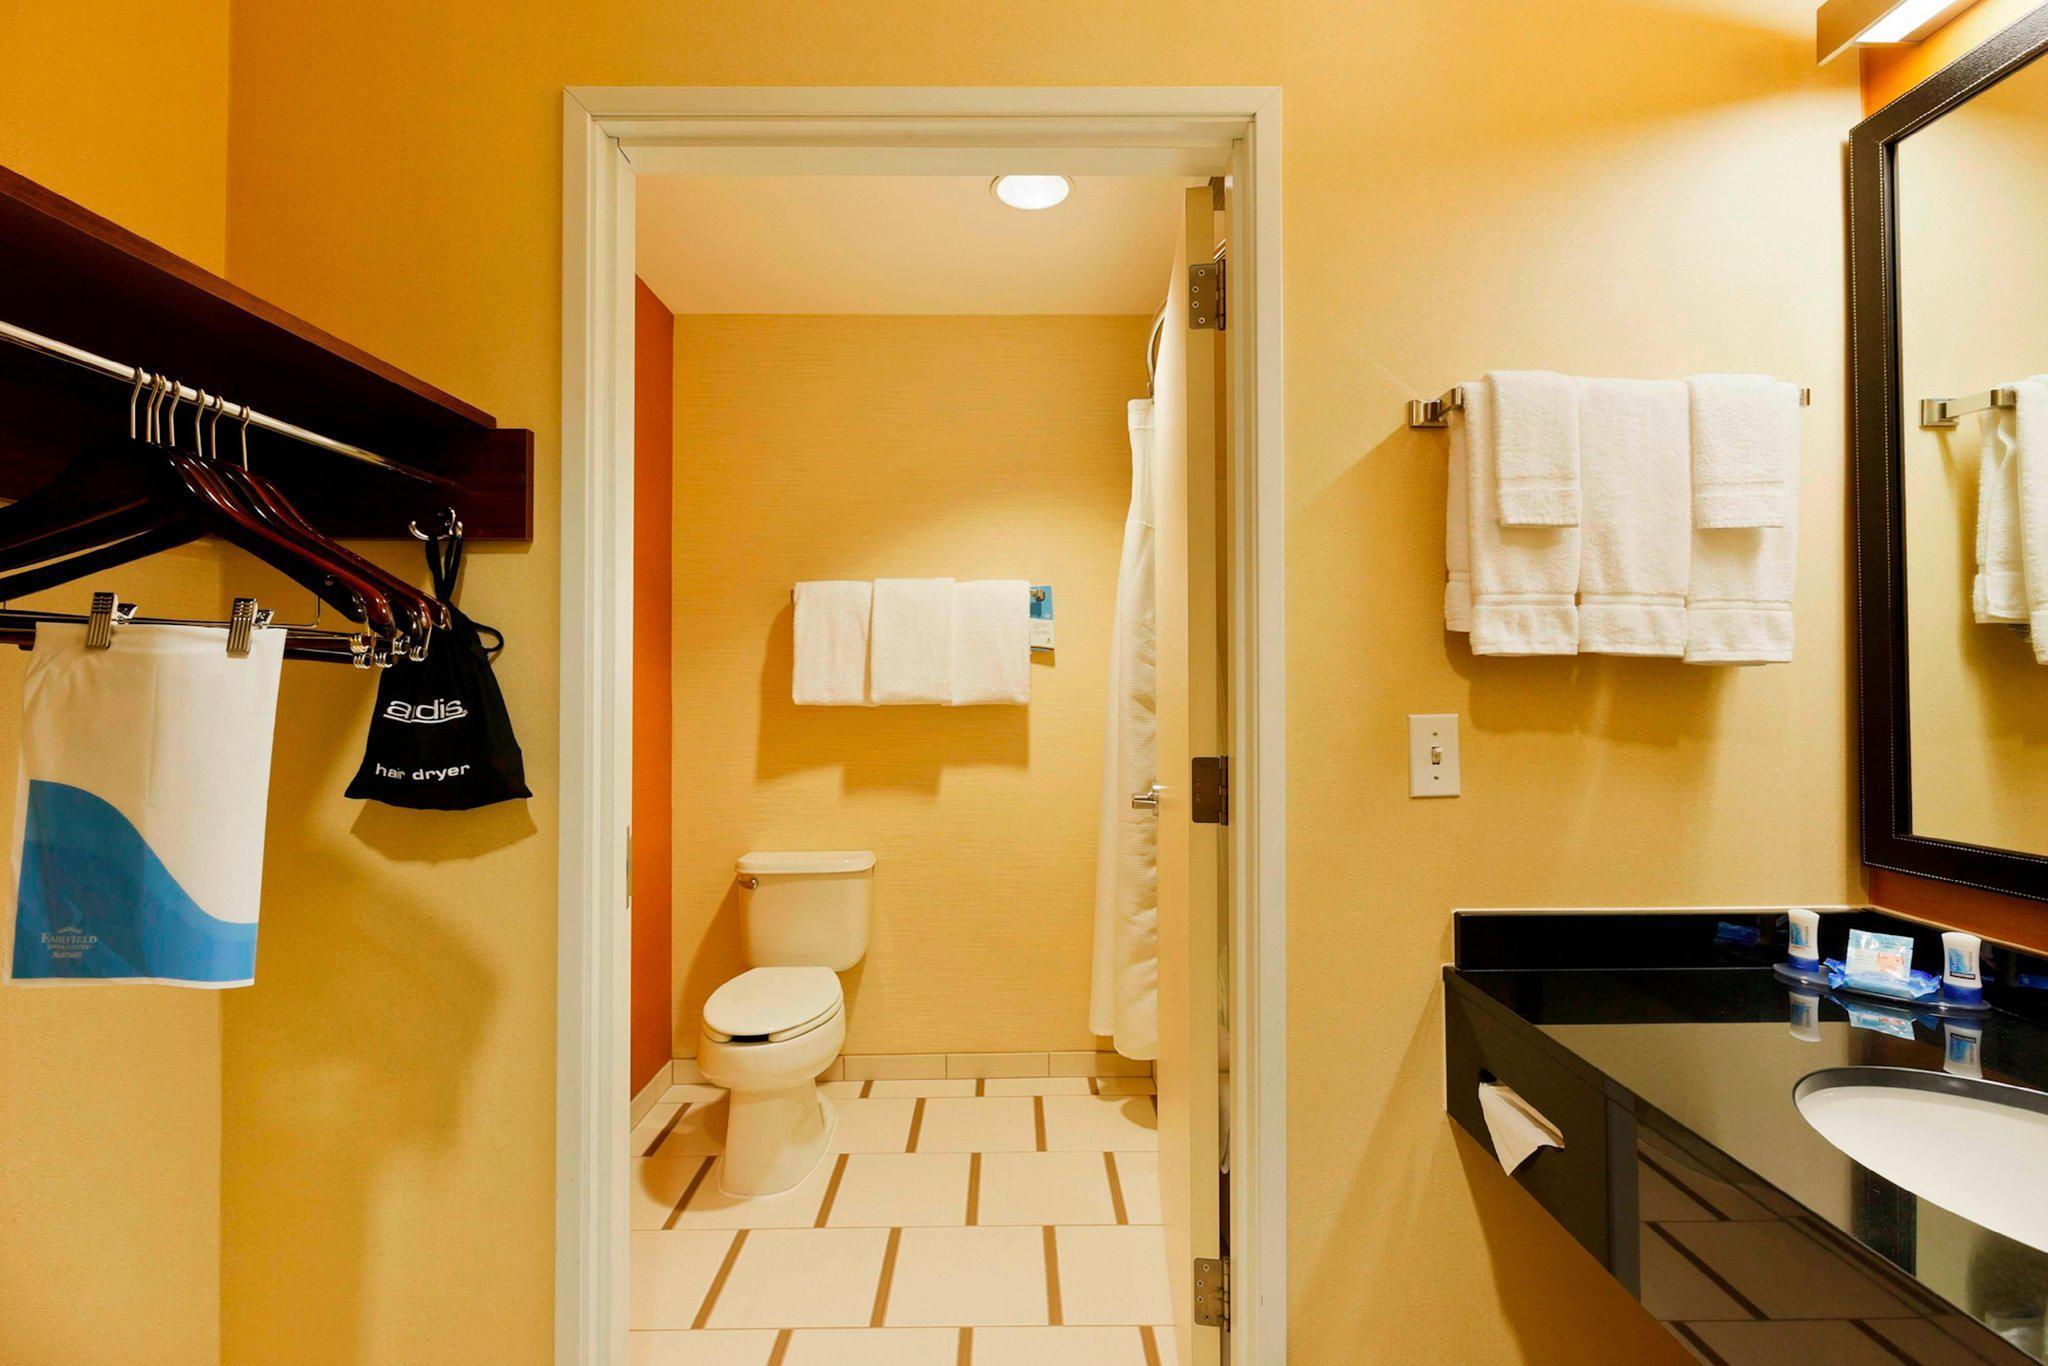 Fairfield Inn & Suites by Marriott Portland South/Lake Oswego